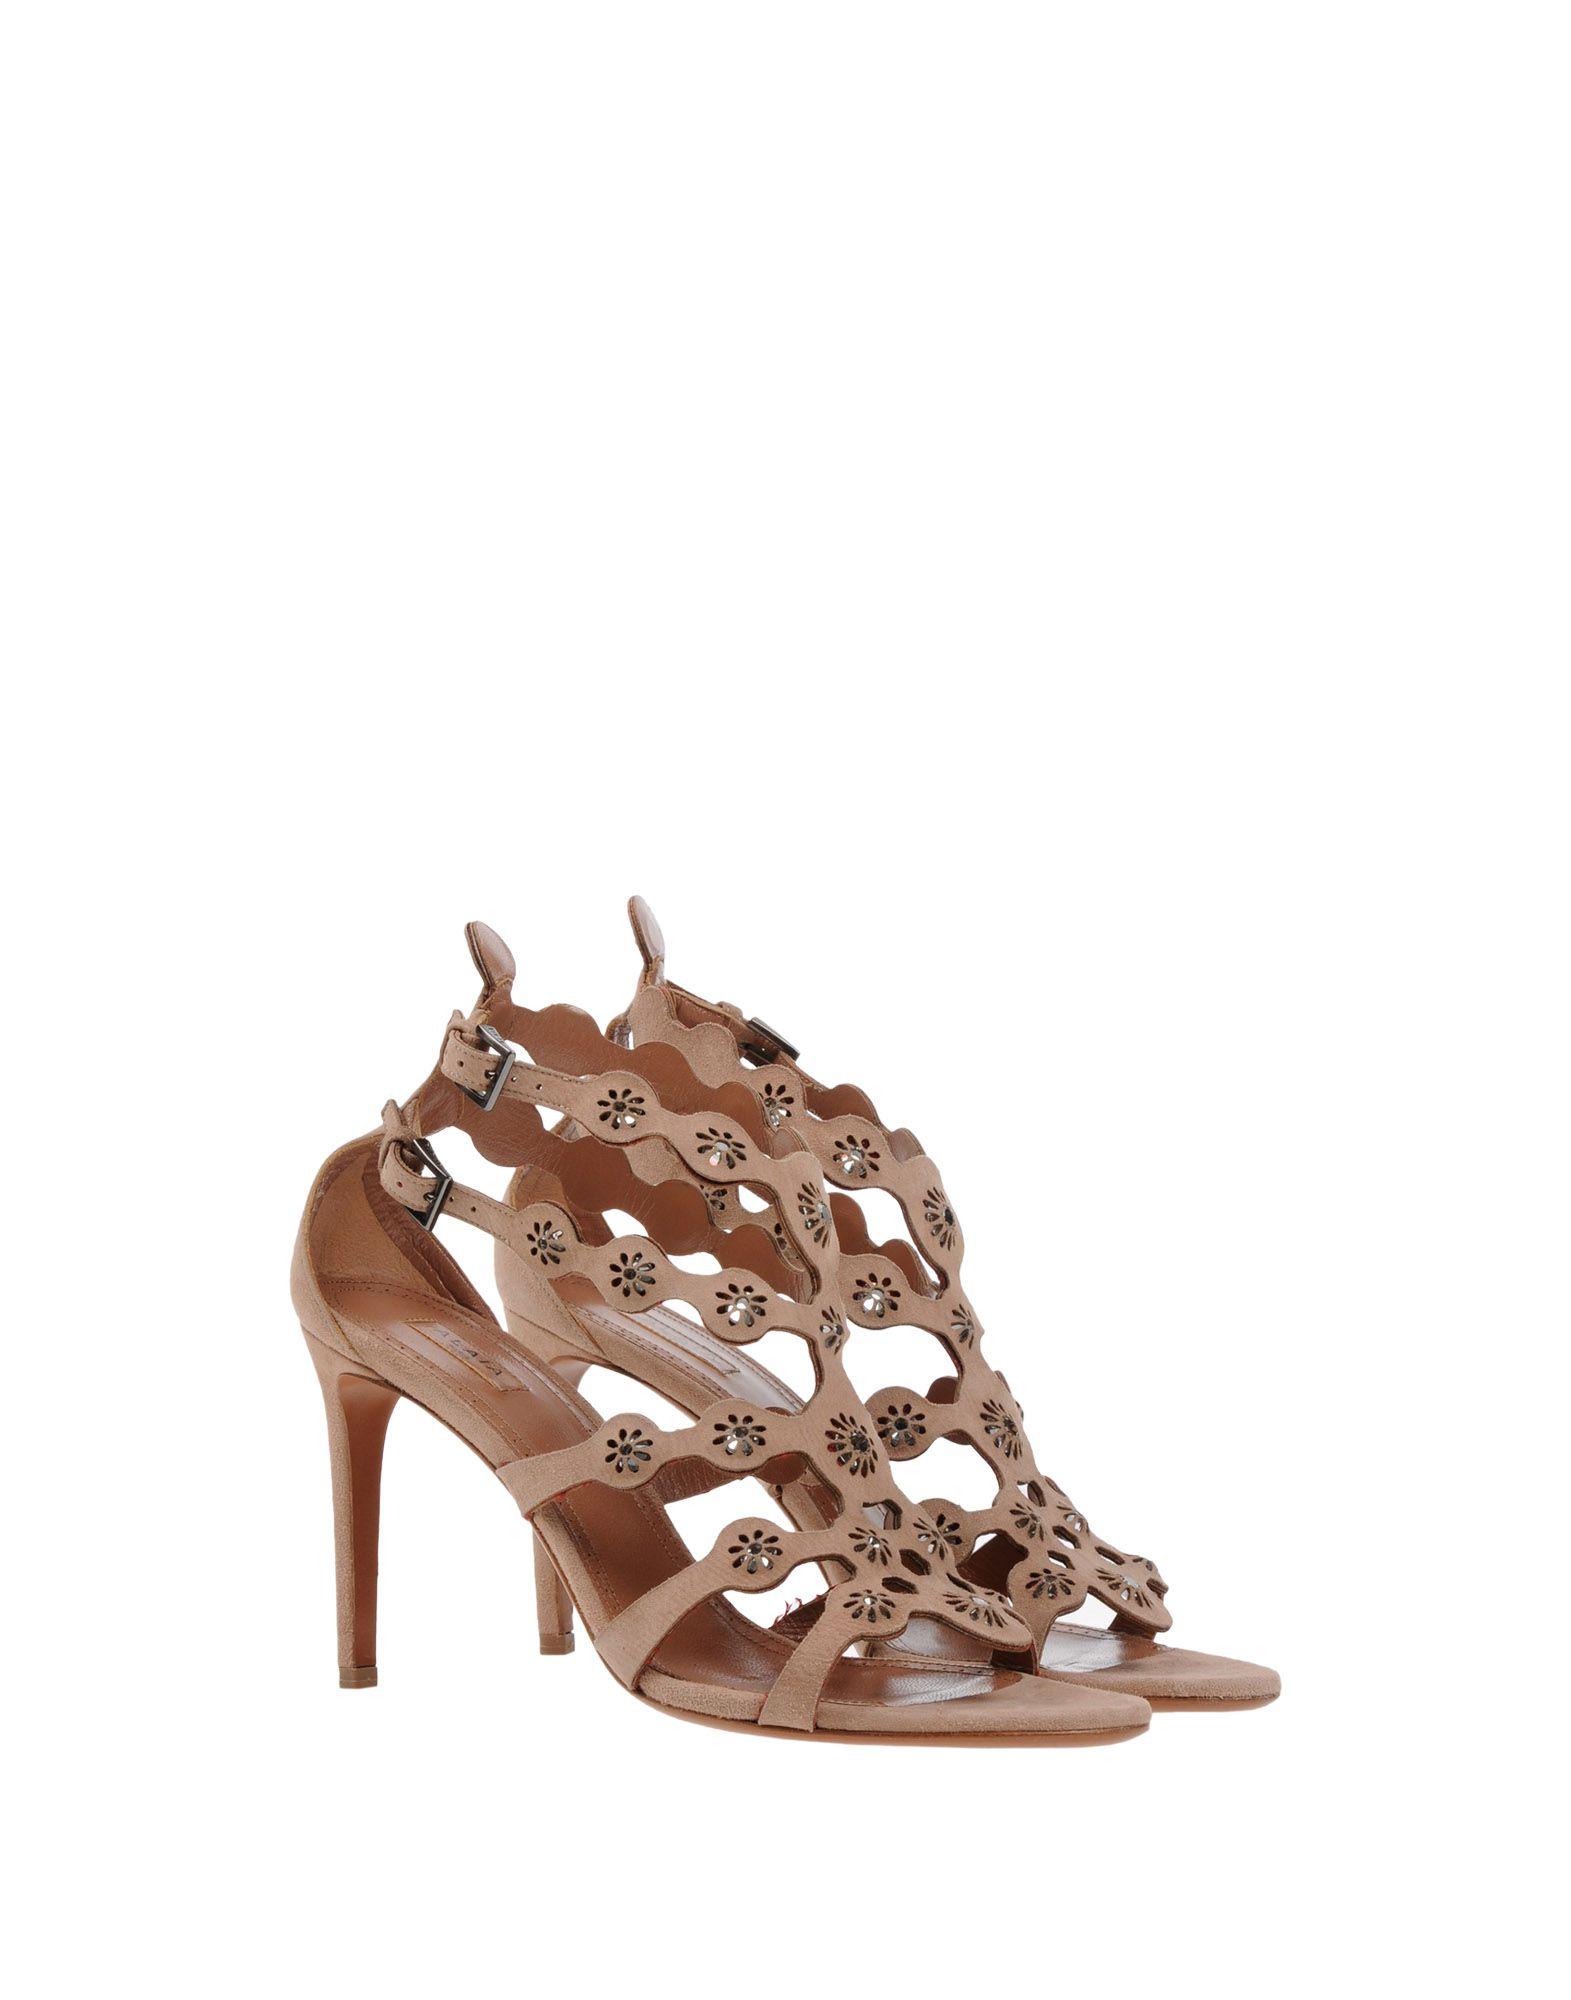 Alaïa Schuhe Sandalen Damen  11406531FD Heiße Schuhe Alaïa 6ee0ea